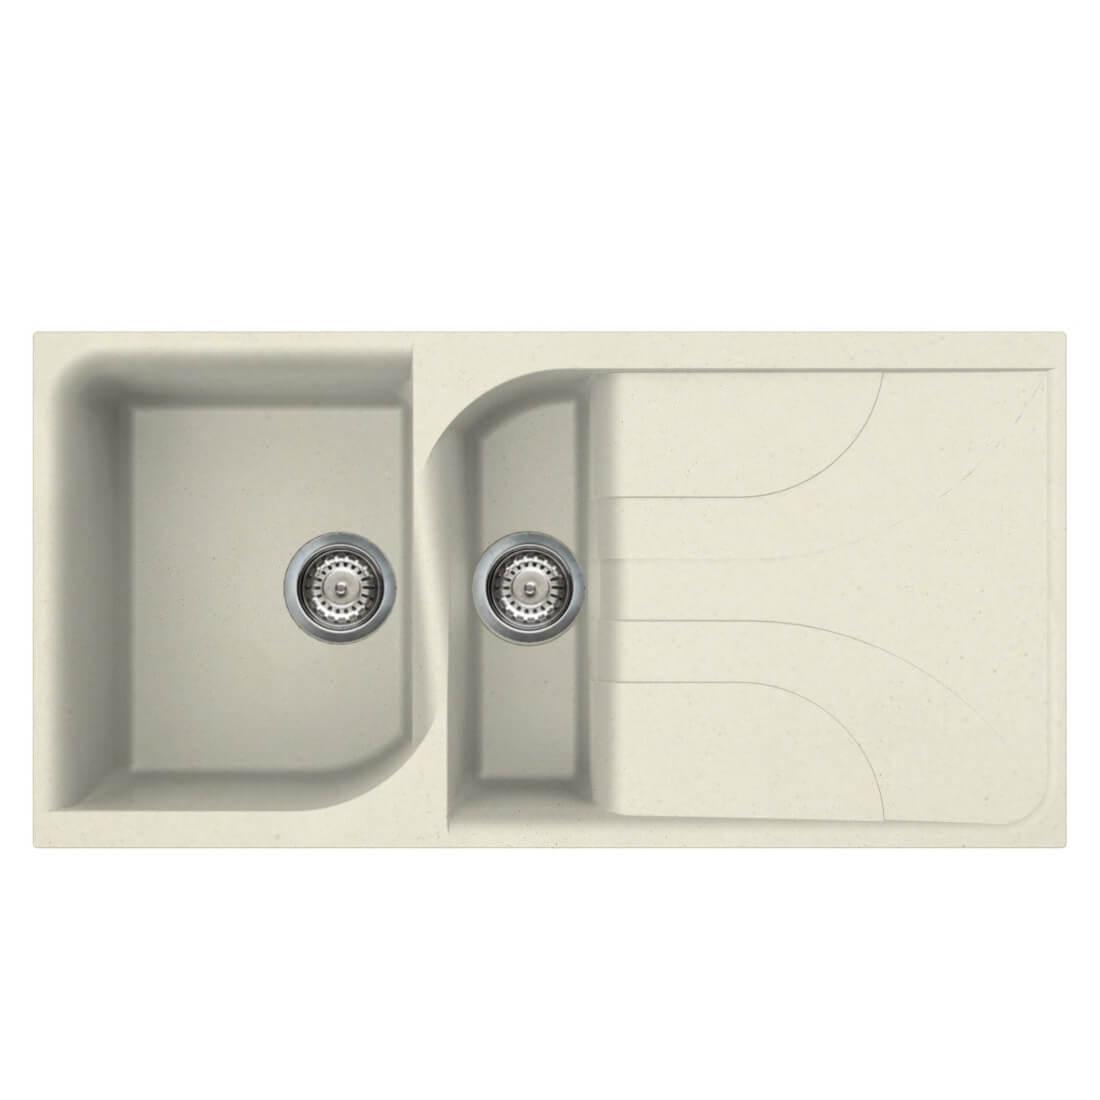 Super Reginox Ego 475 Inset 1 5 Bowl 1000 X 500Mm Granite Kitchen Interior Design Ideas Inamawefileorg